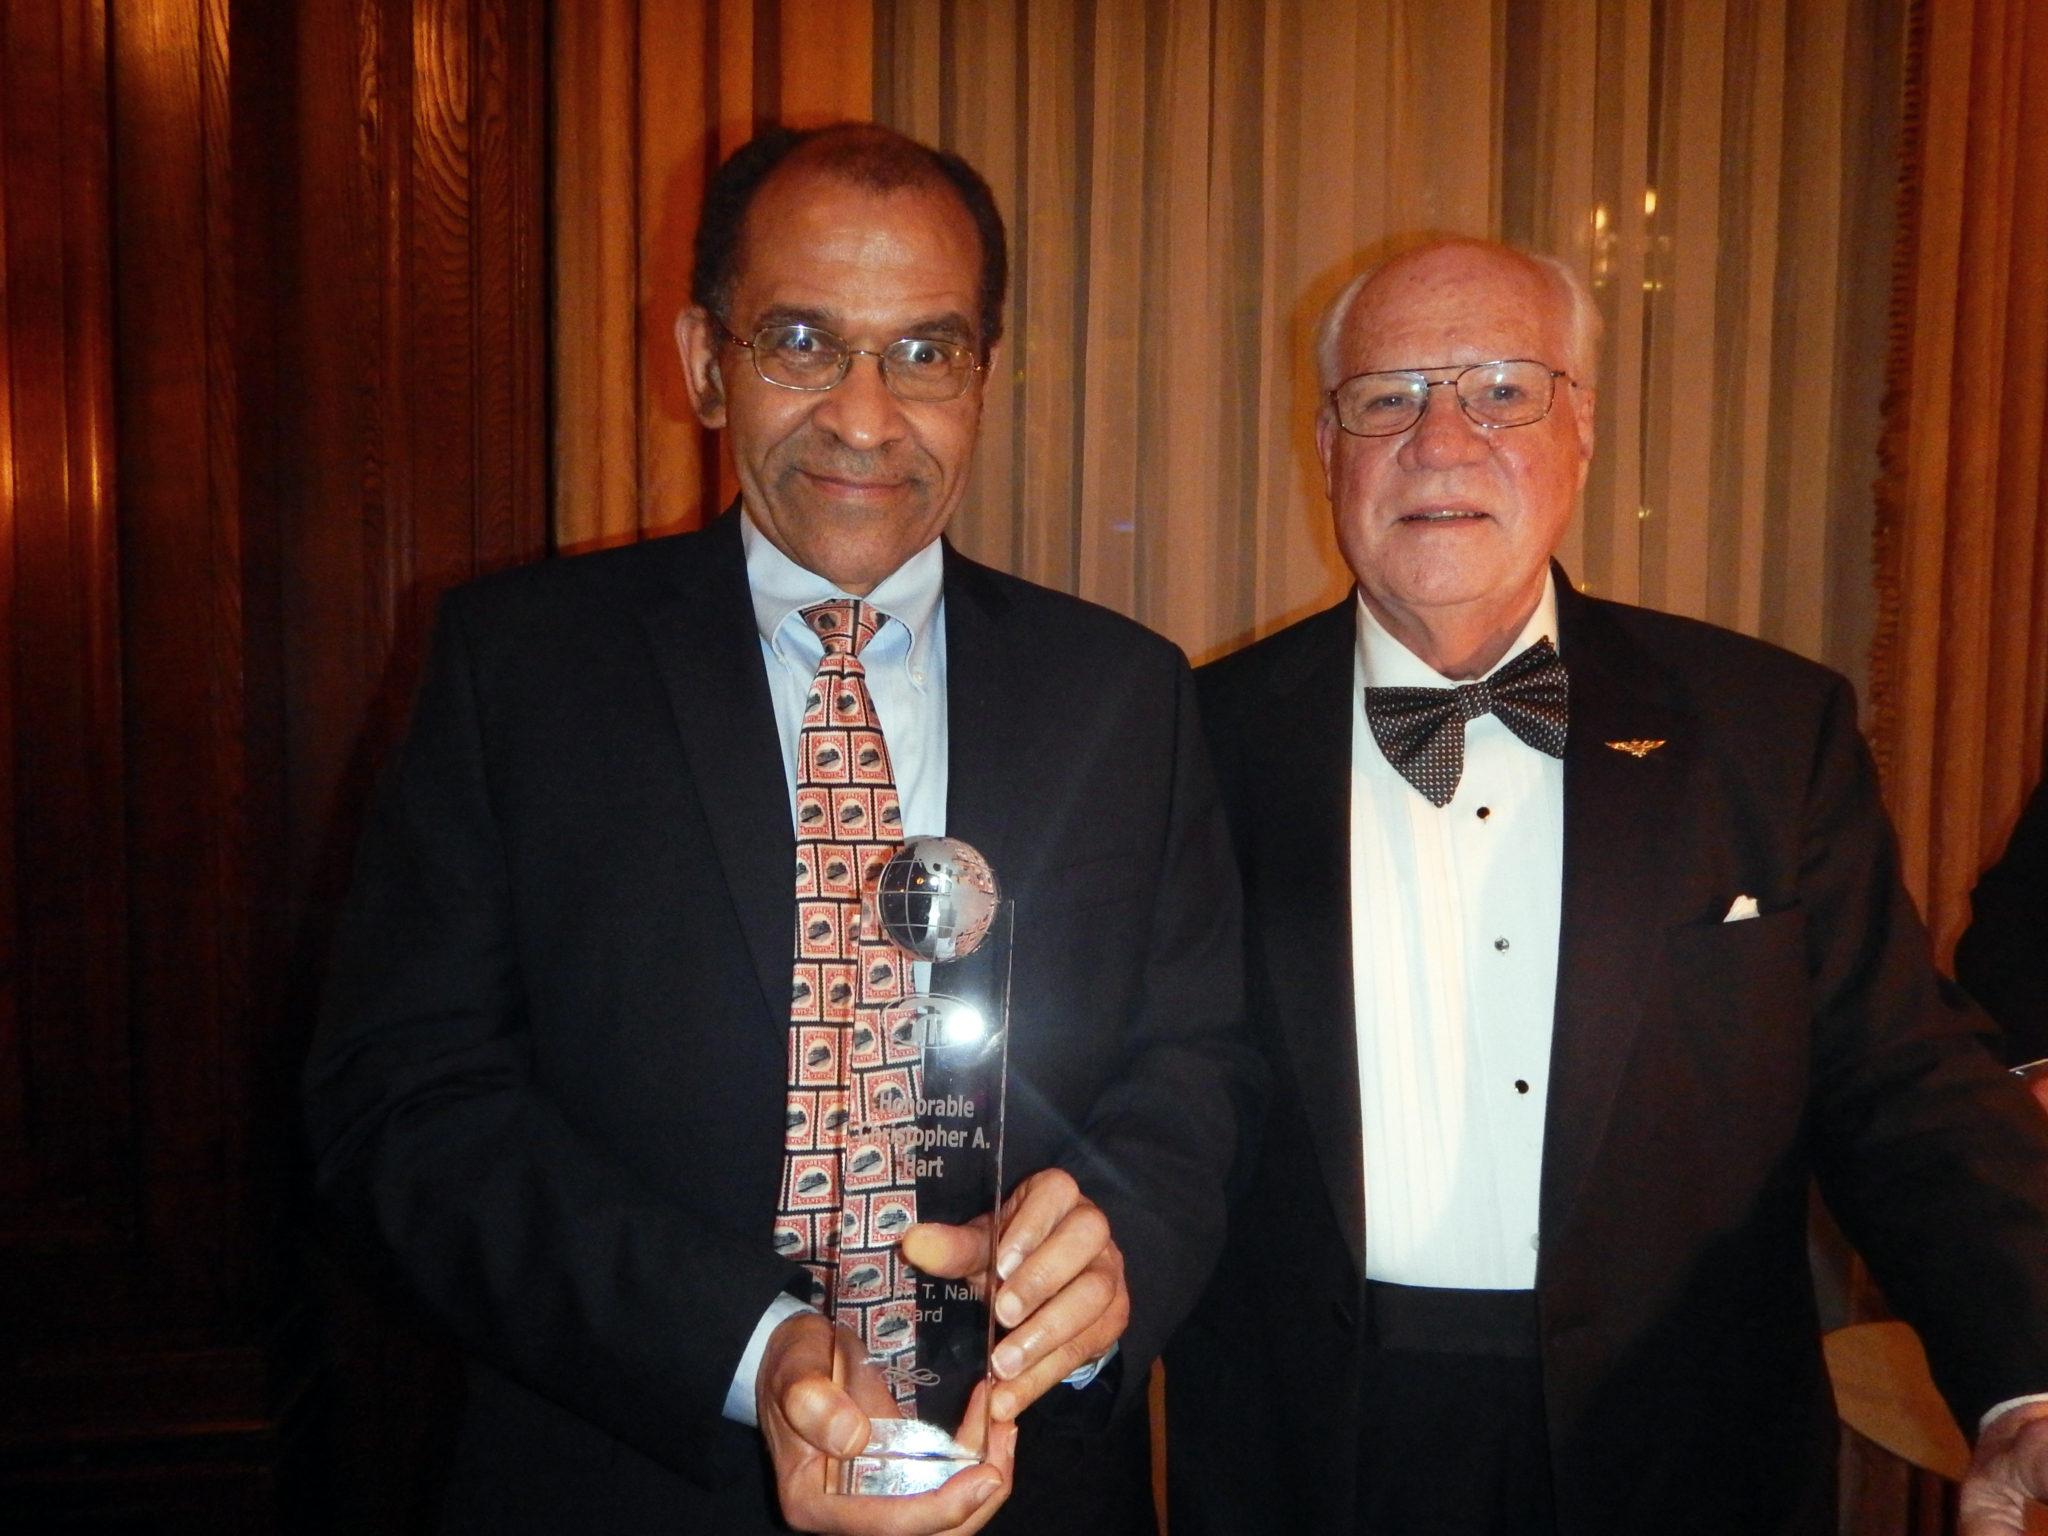 Tony Jobe presents Former NTSB Chair Hart with the Nall Award; Photo by Robert L. Feldman